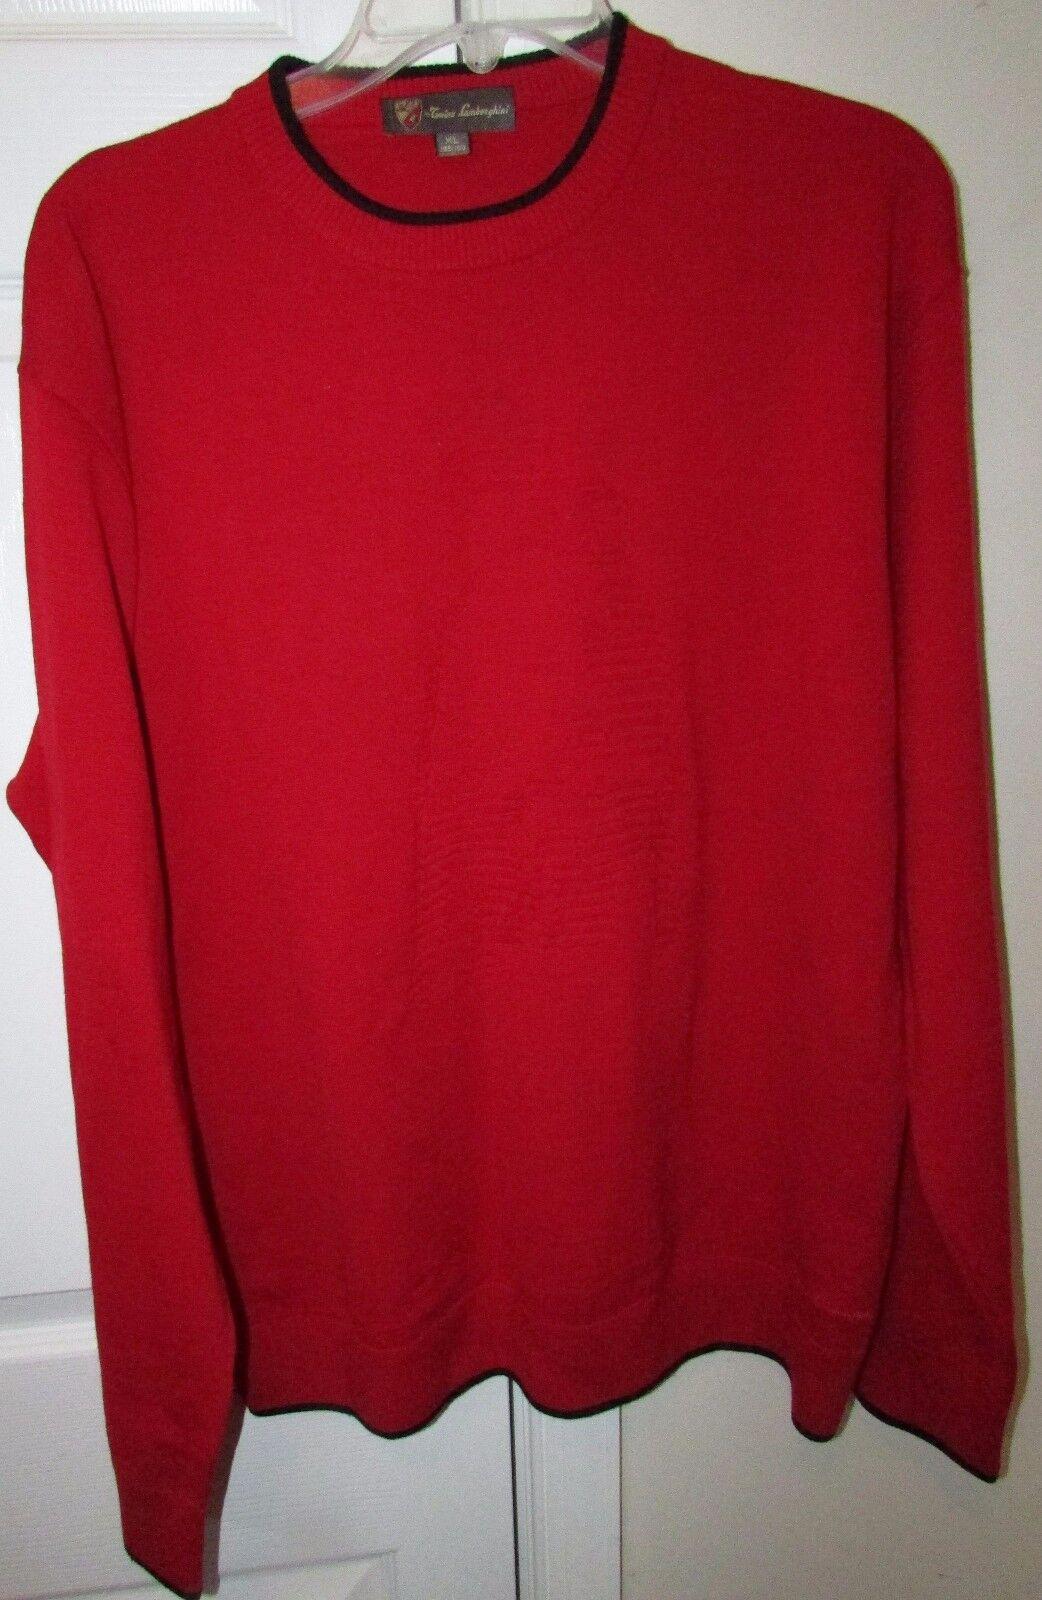 Tonino Lamborghini Merino Wool ROT Sweater XL EUC